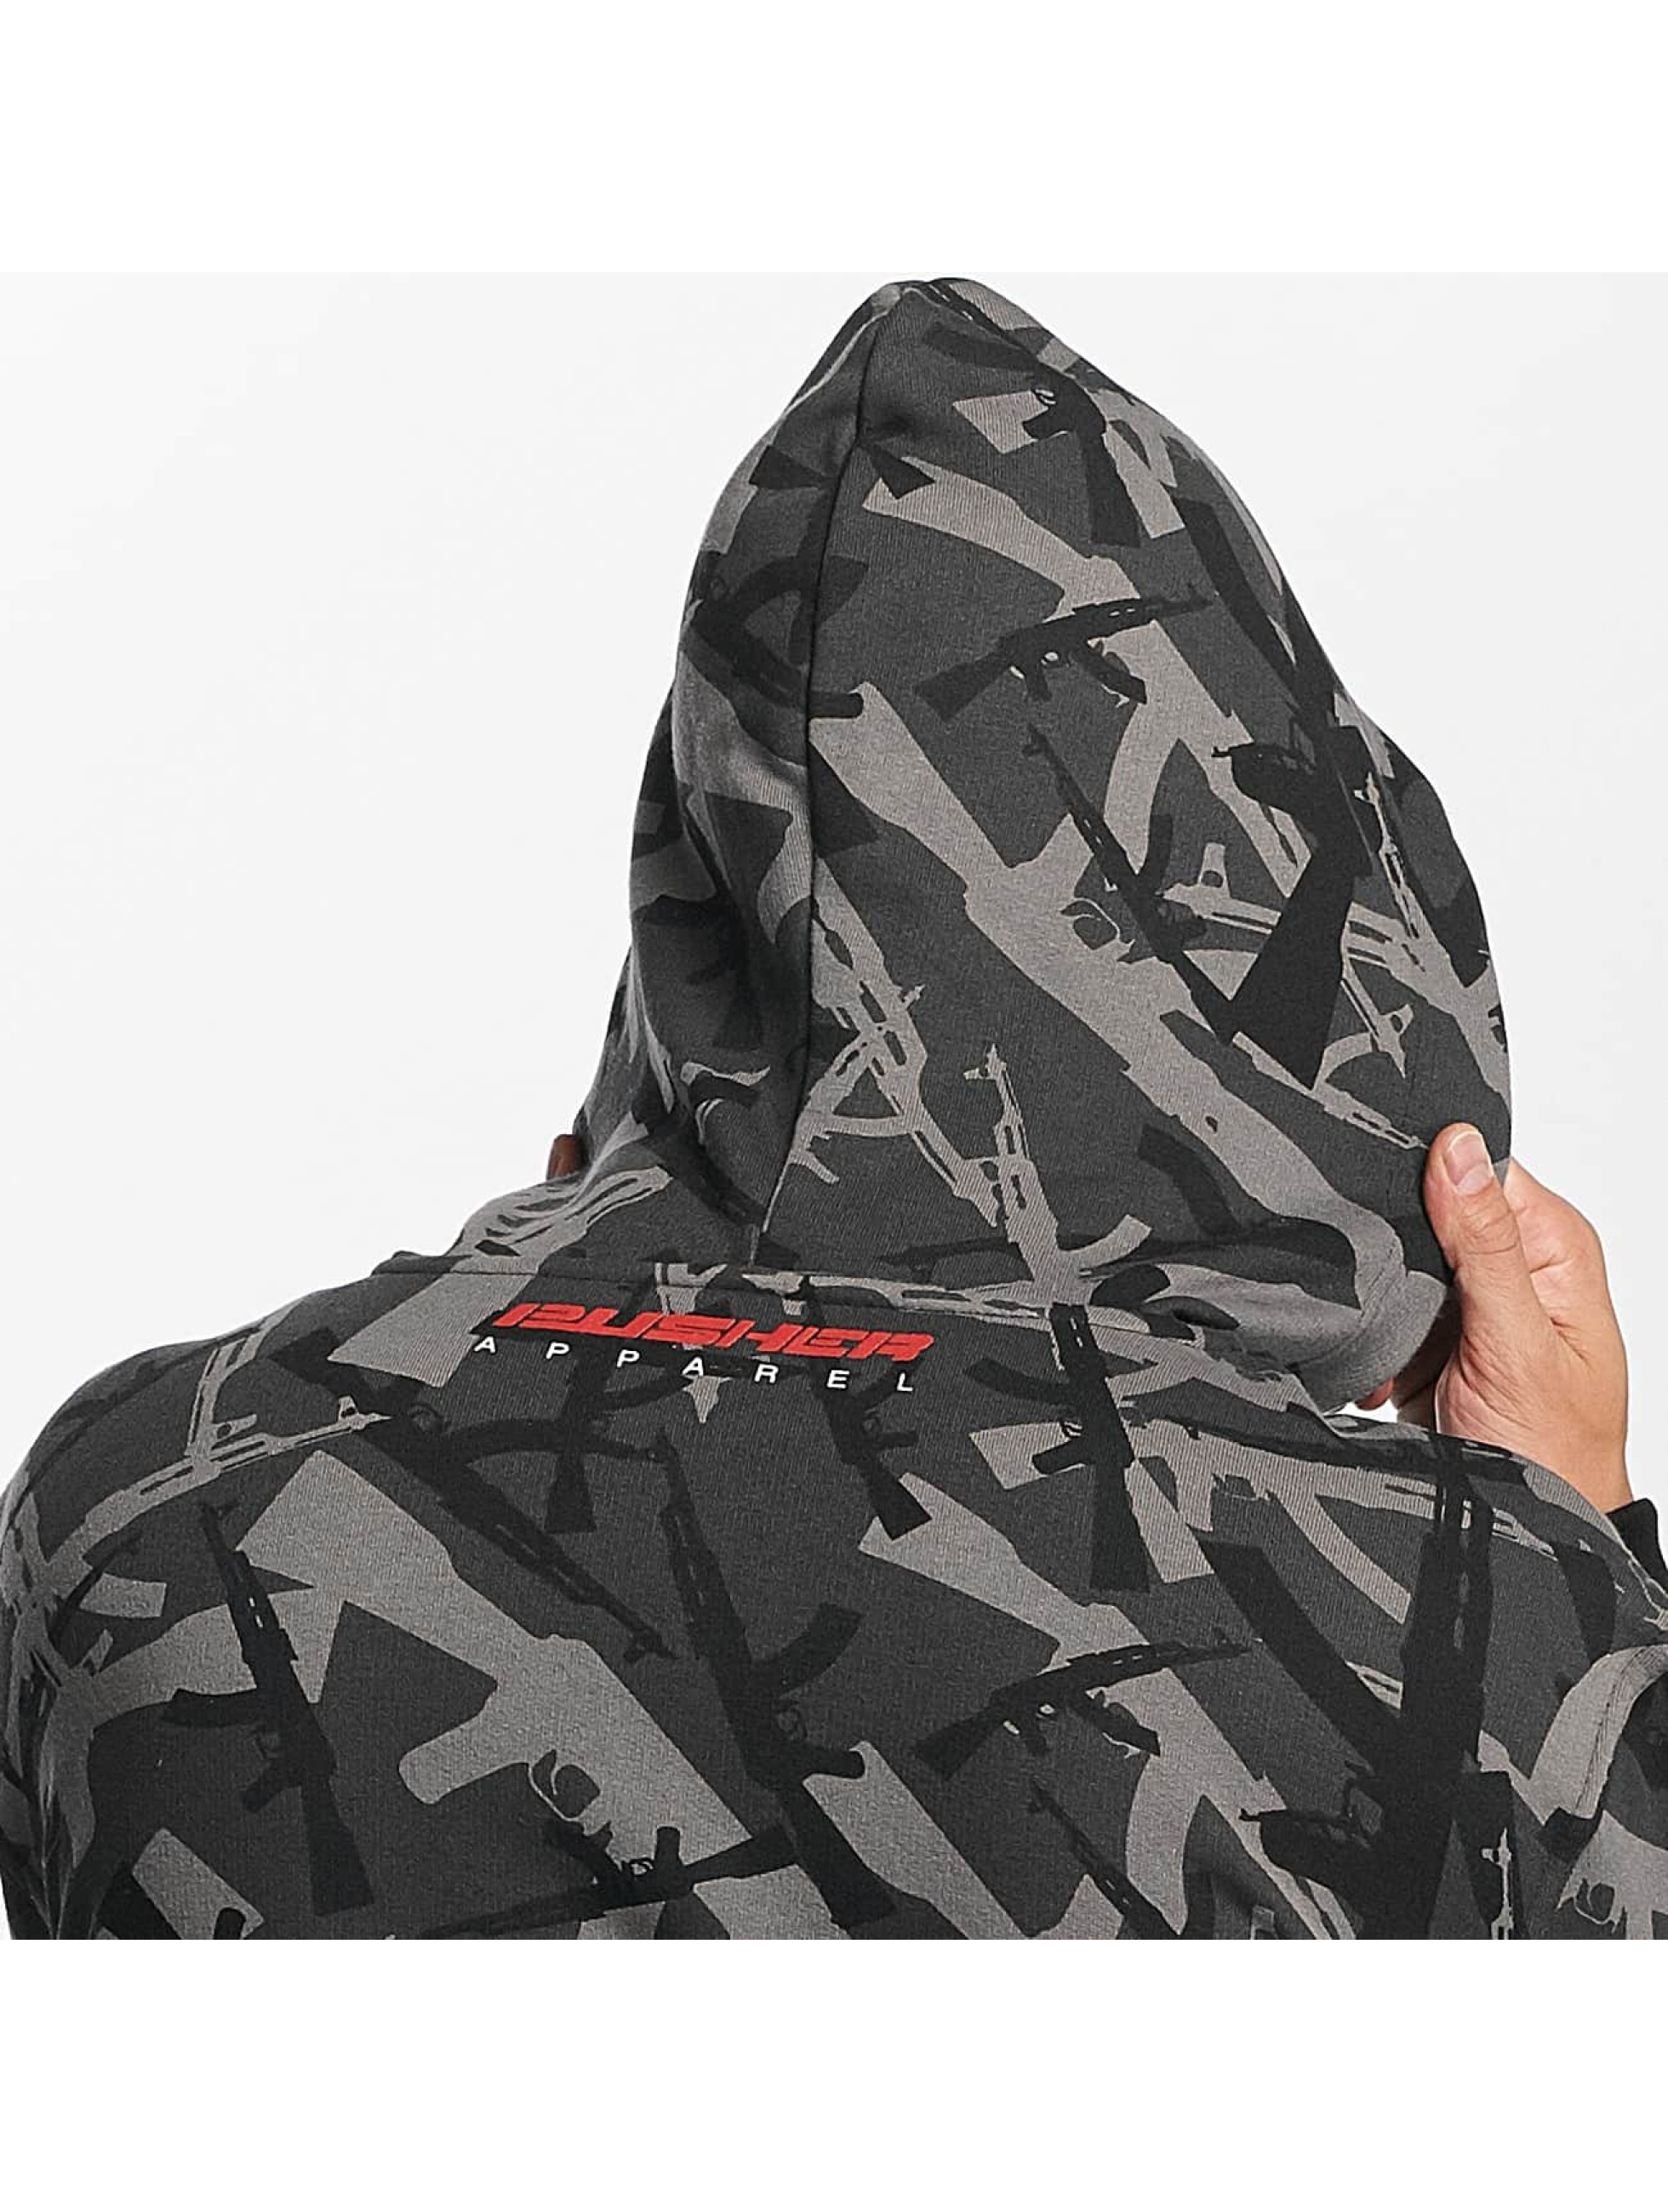 Pusher Apparel Hoodie AK Camo camouflage